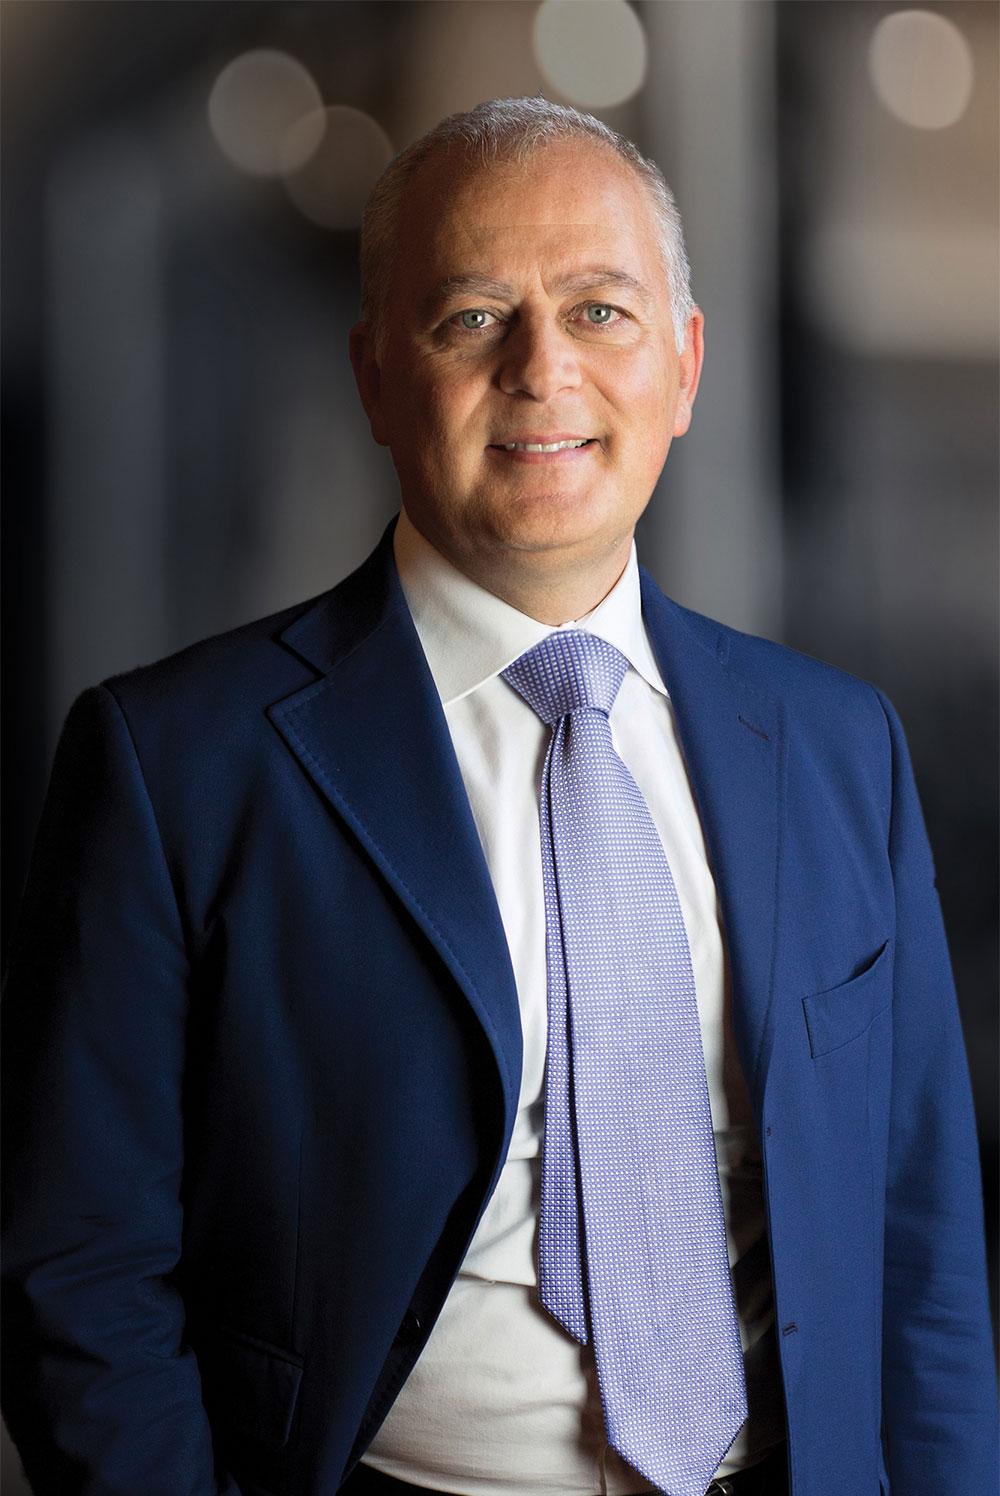 Claudio Giordano